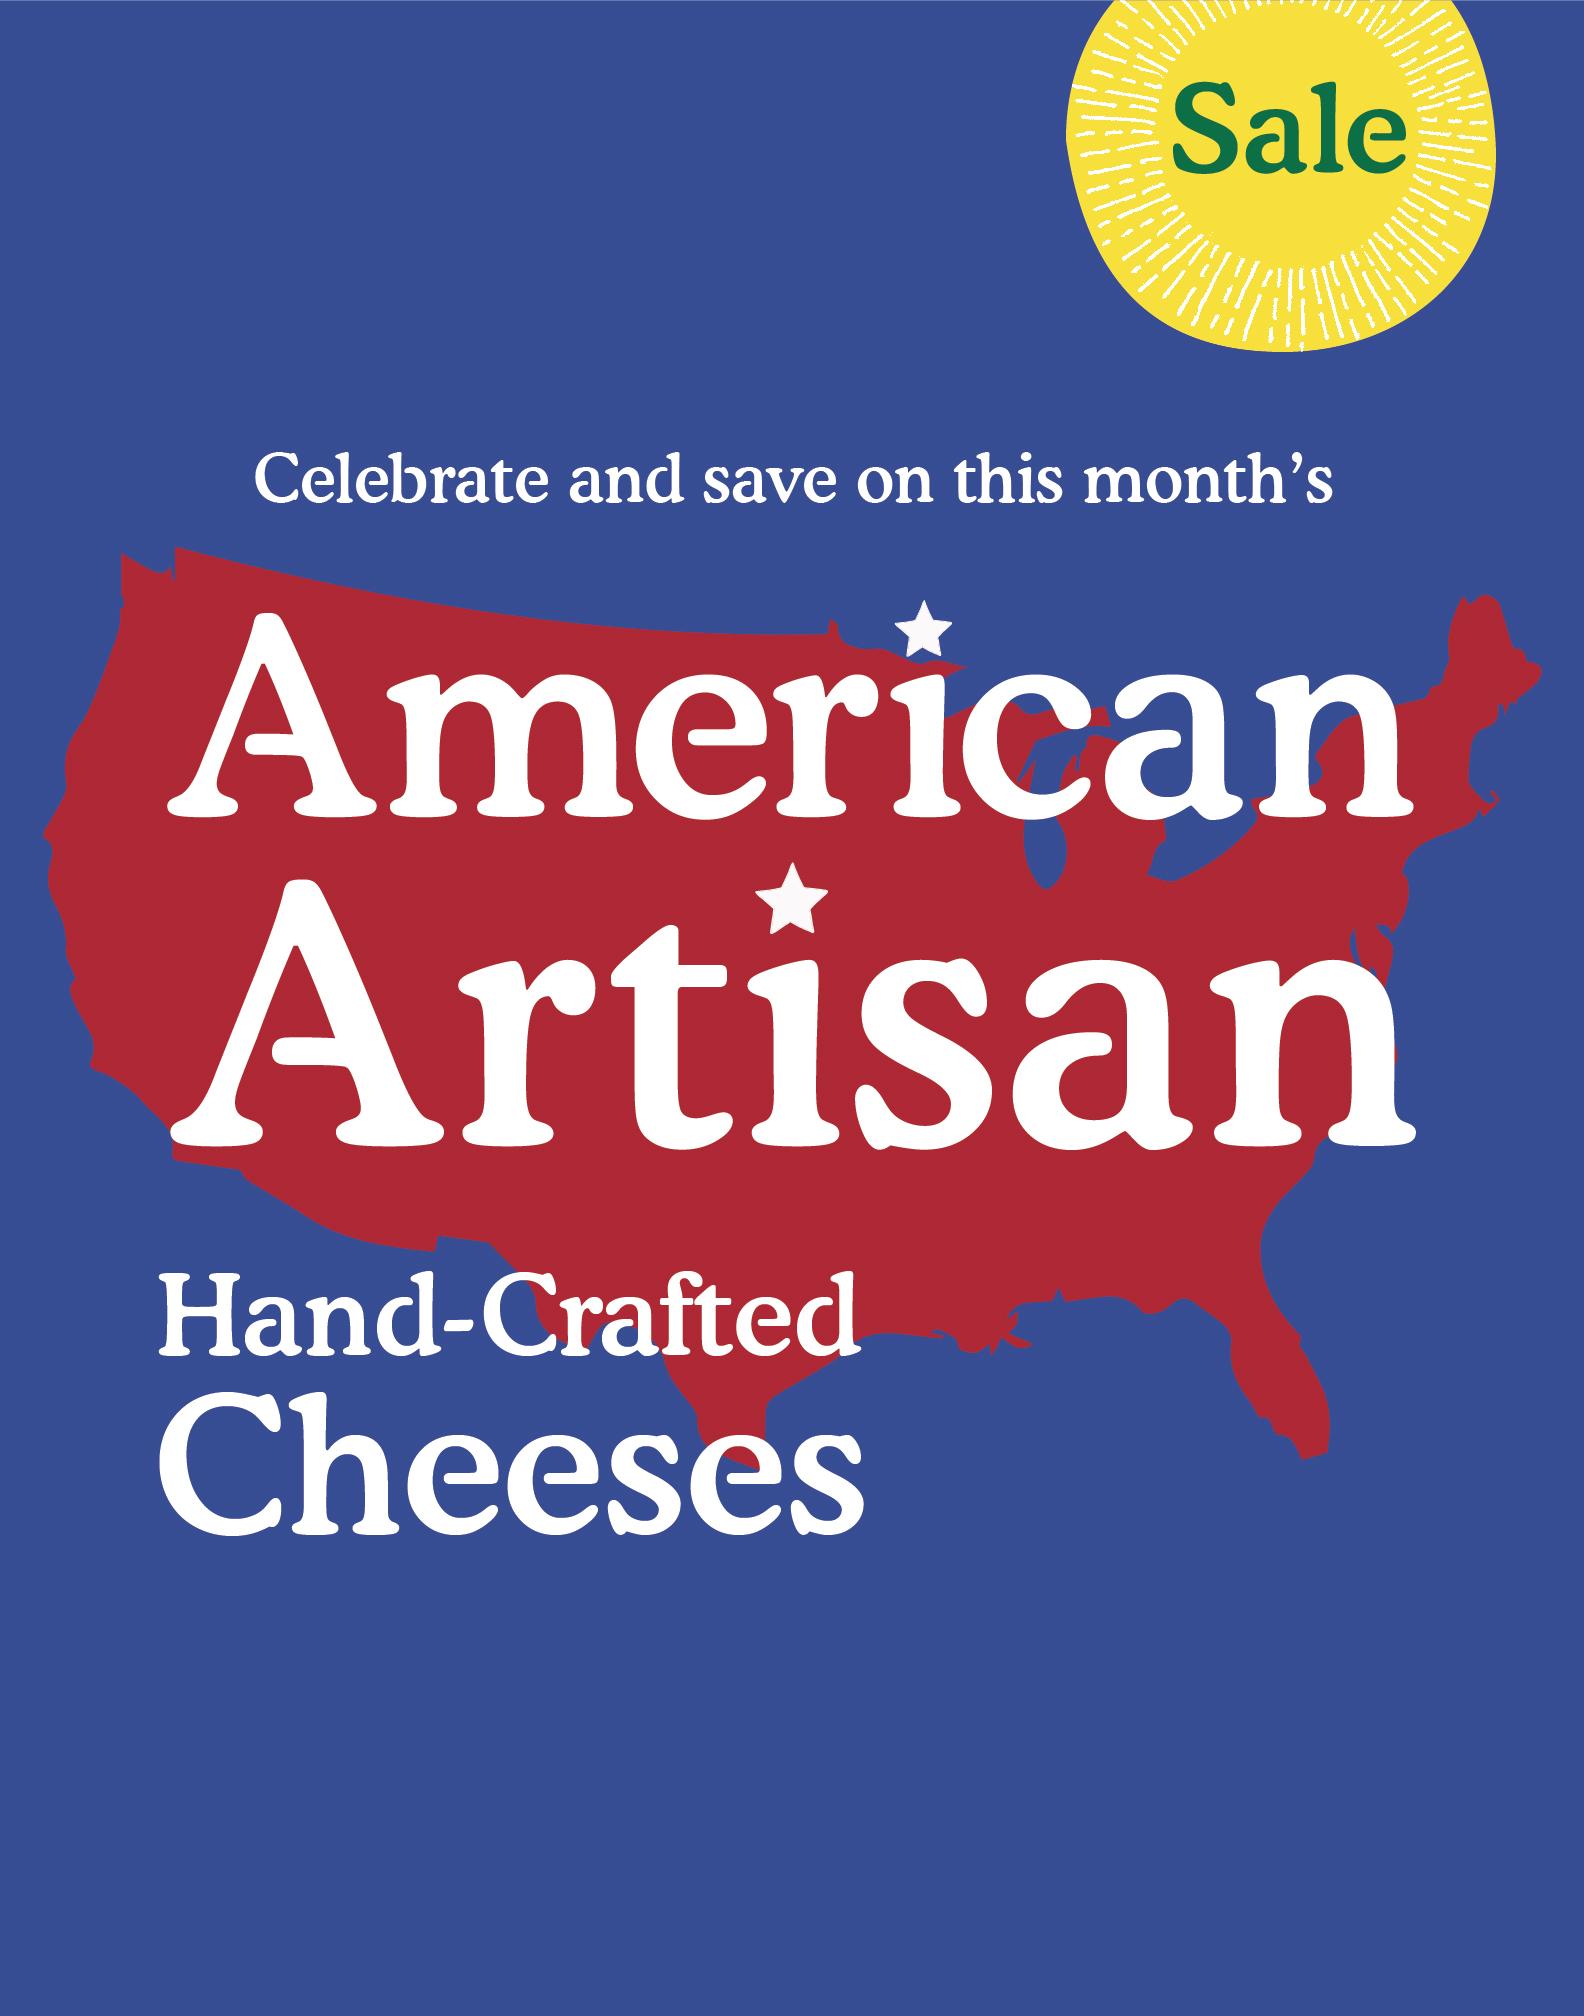 American_Artisan_Poster_22x28-01.jpg